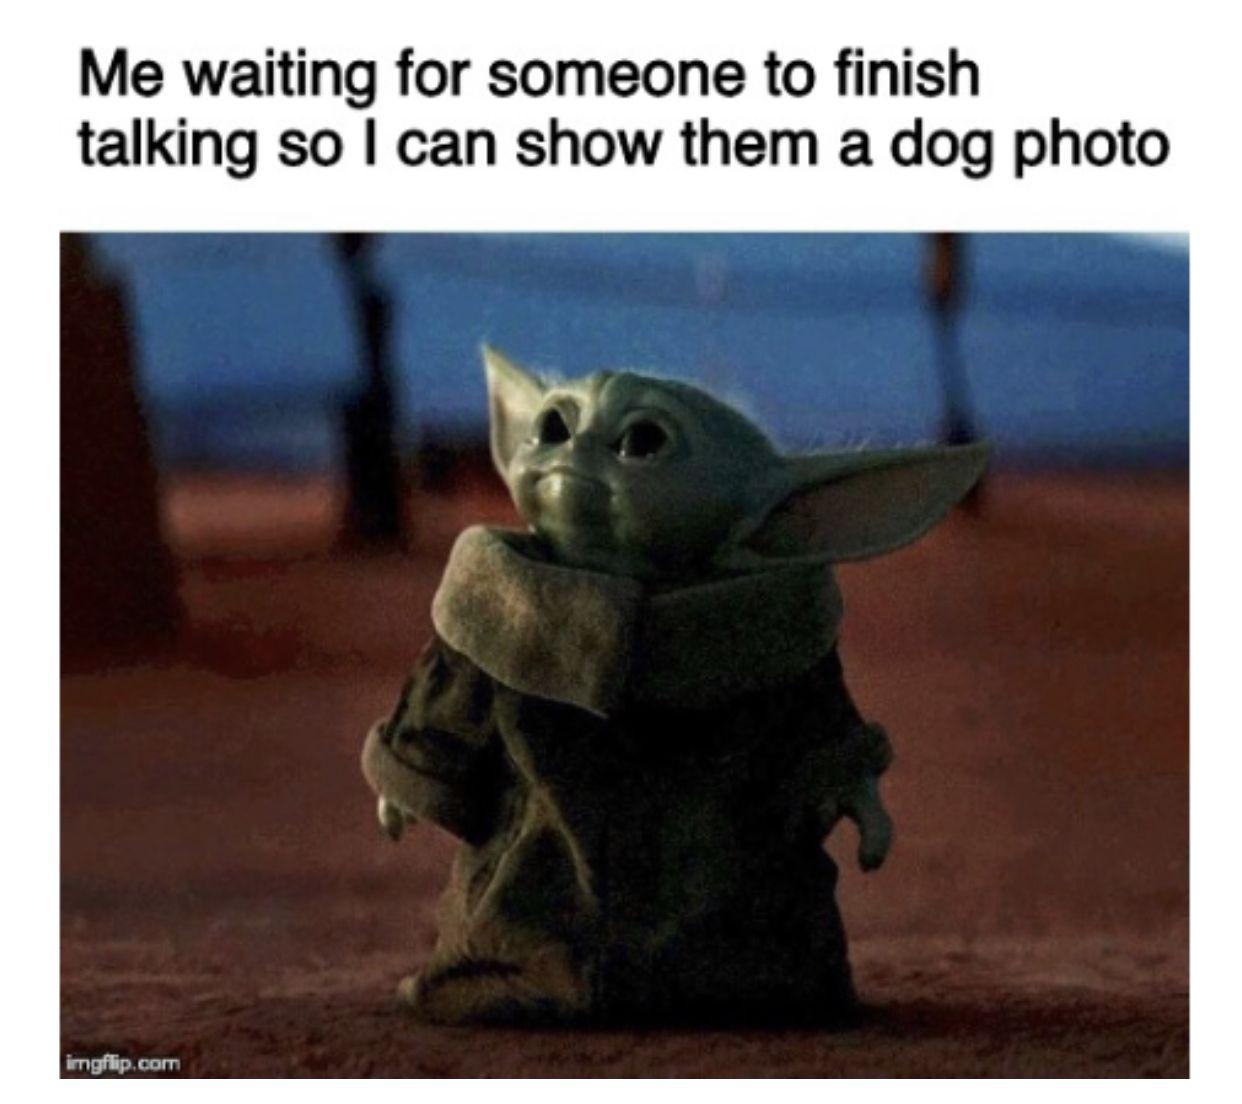 Pin By Ravenbloom On Baby Yoda In 2020 Yoda Meme Funny Memes Memes